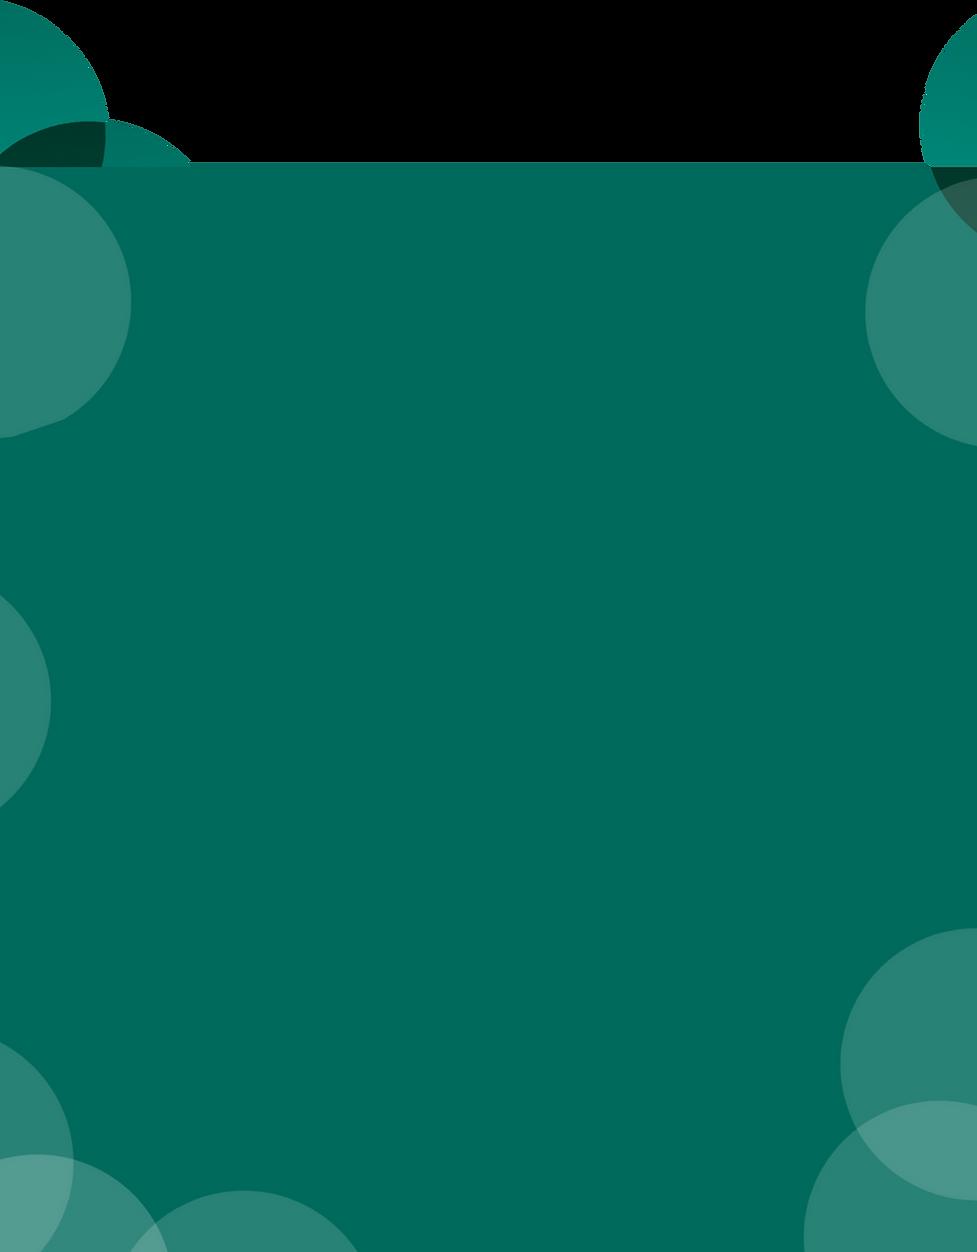 FAQ_Background.png